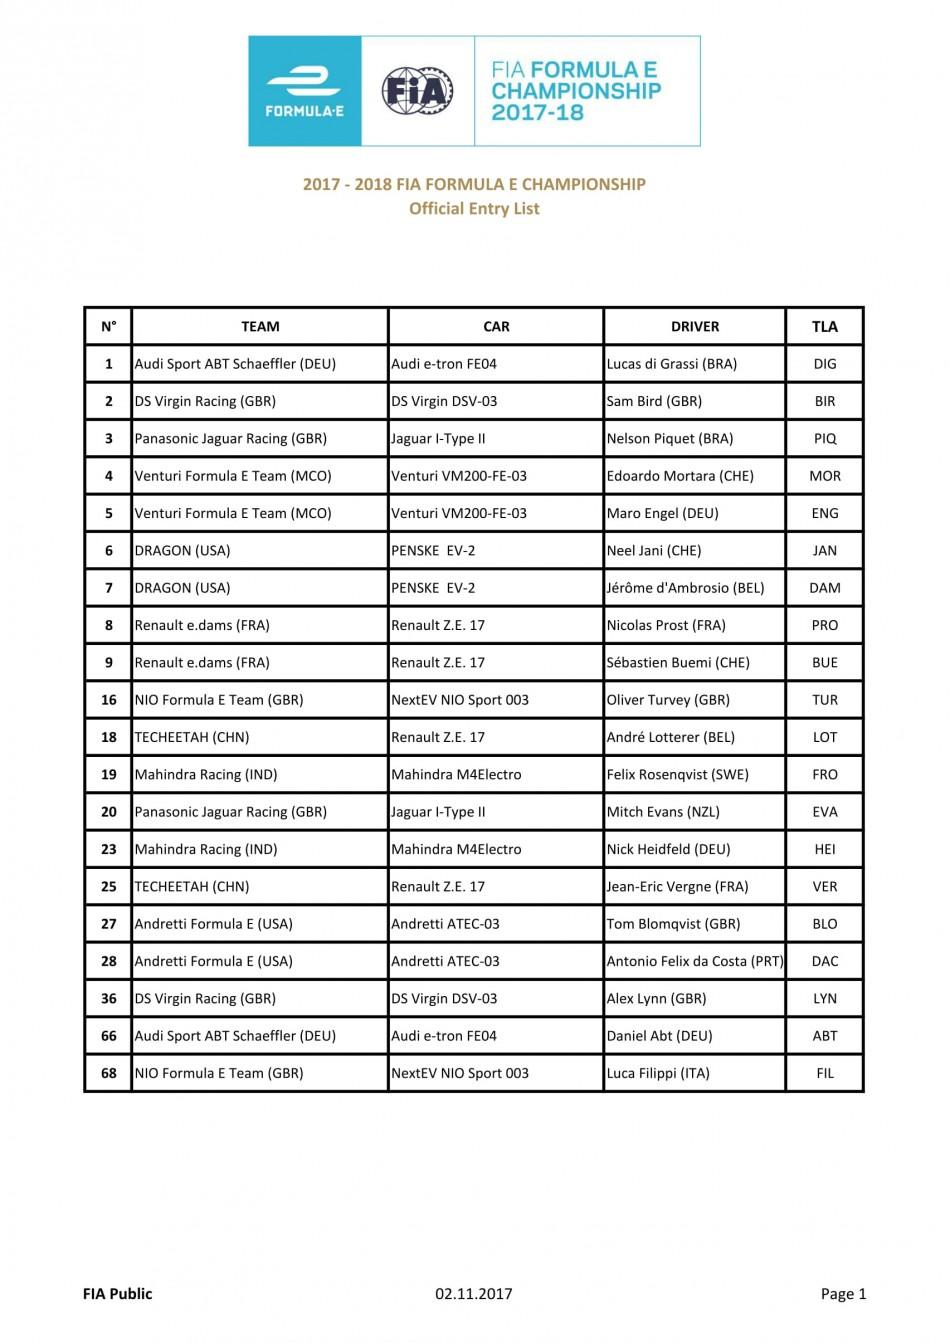 Formula E Entry For 2017 18 Season Confirmed Federation Calendar